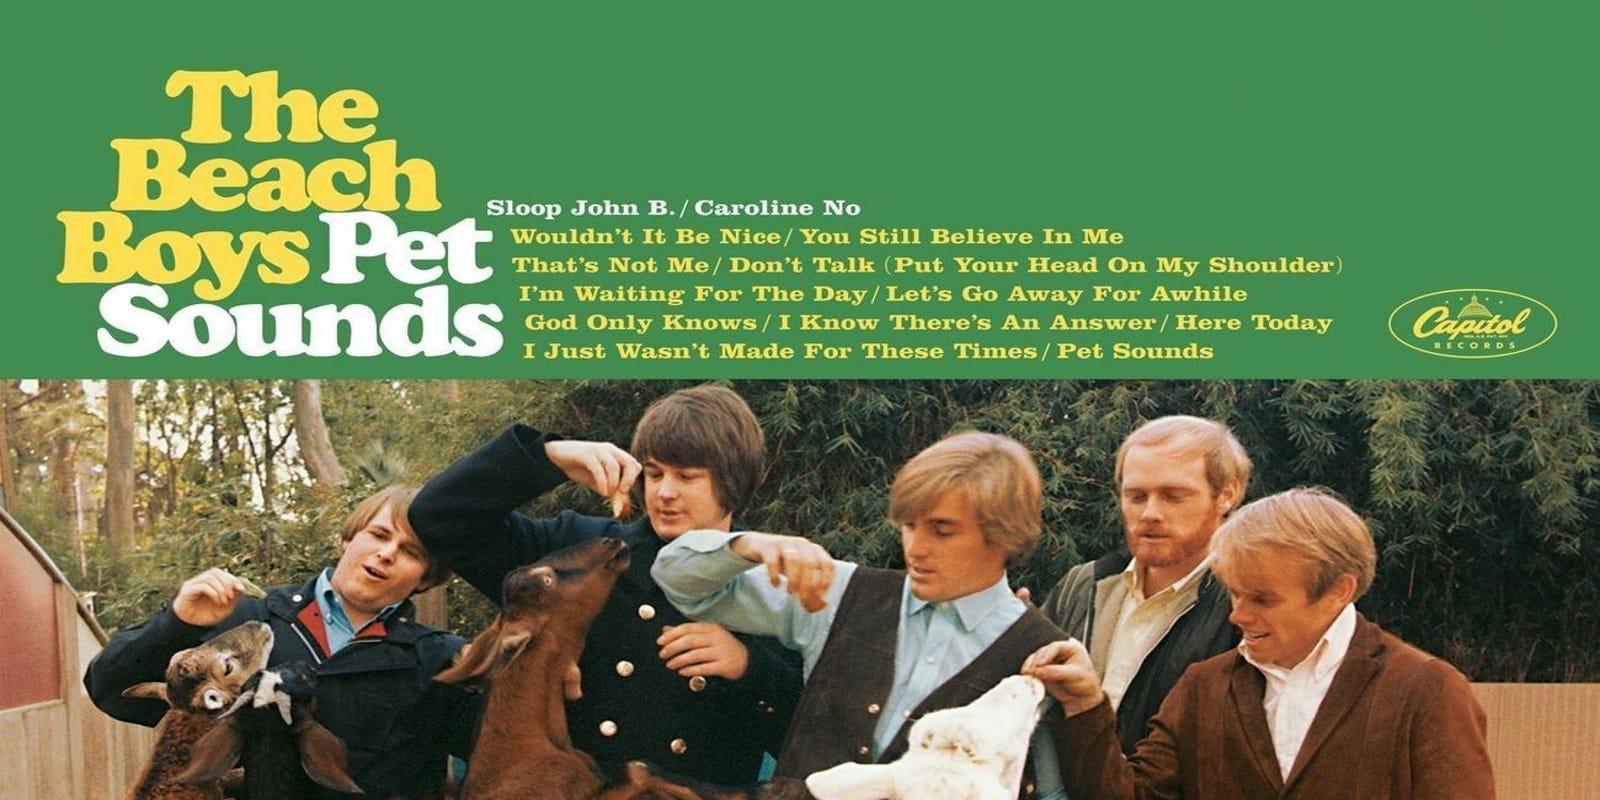 Pet Sounds' is evidence of Brian Wilson's genius